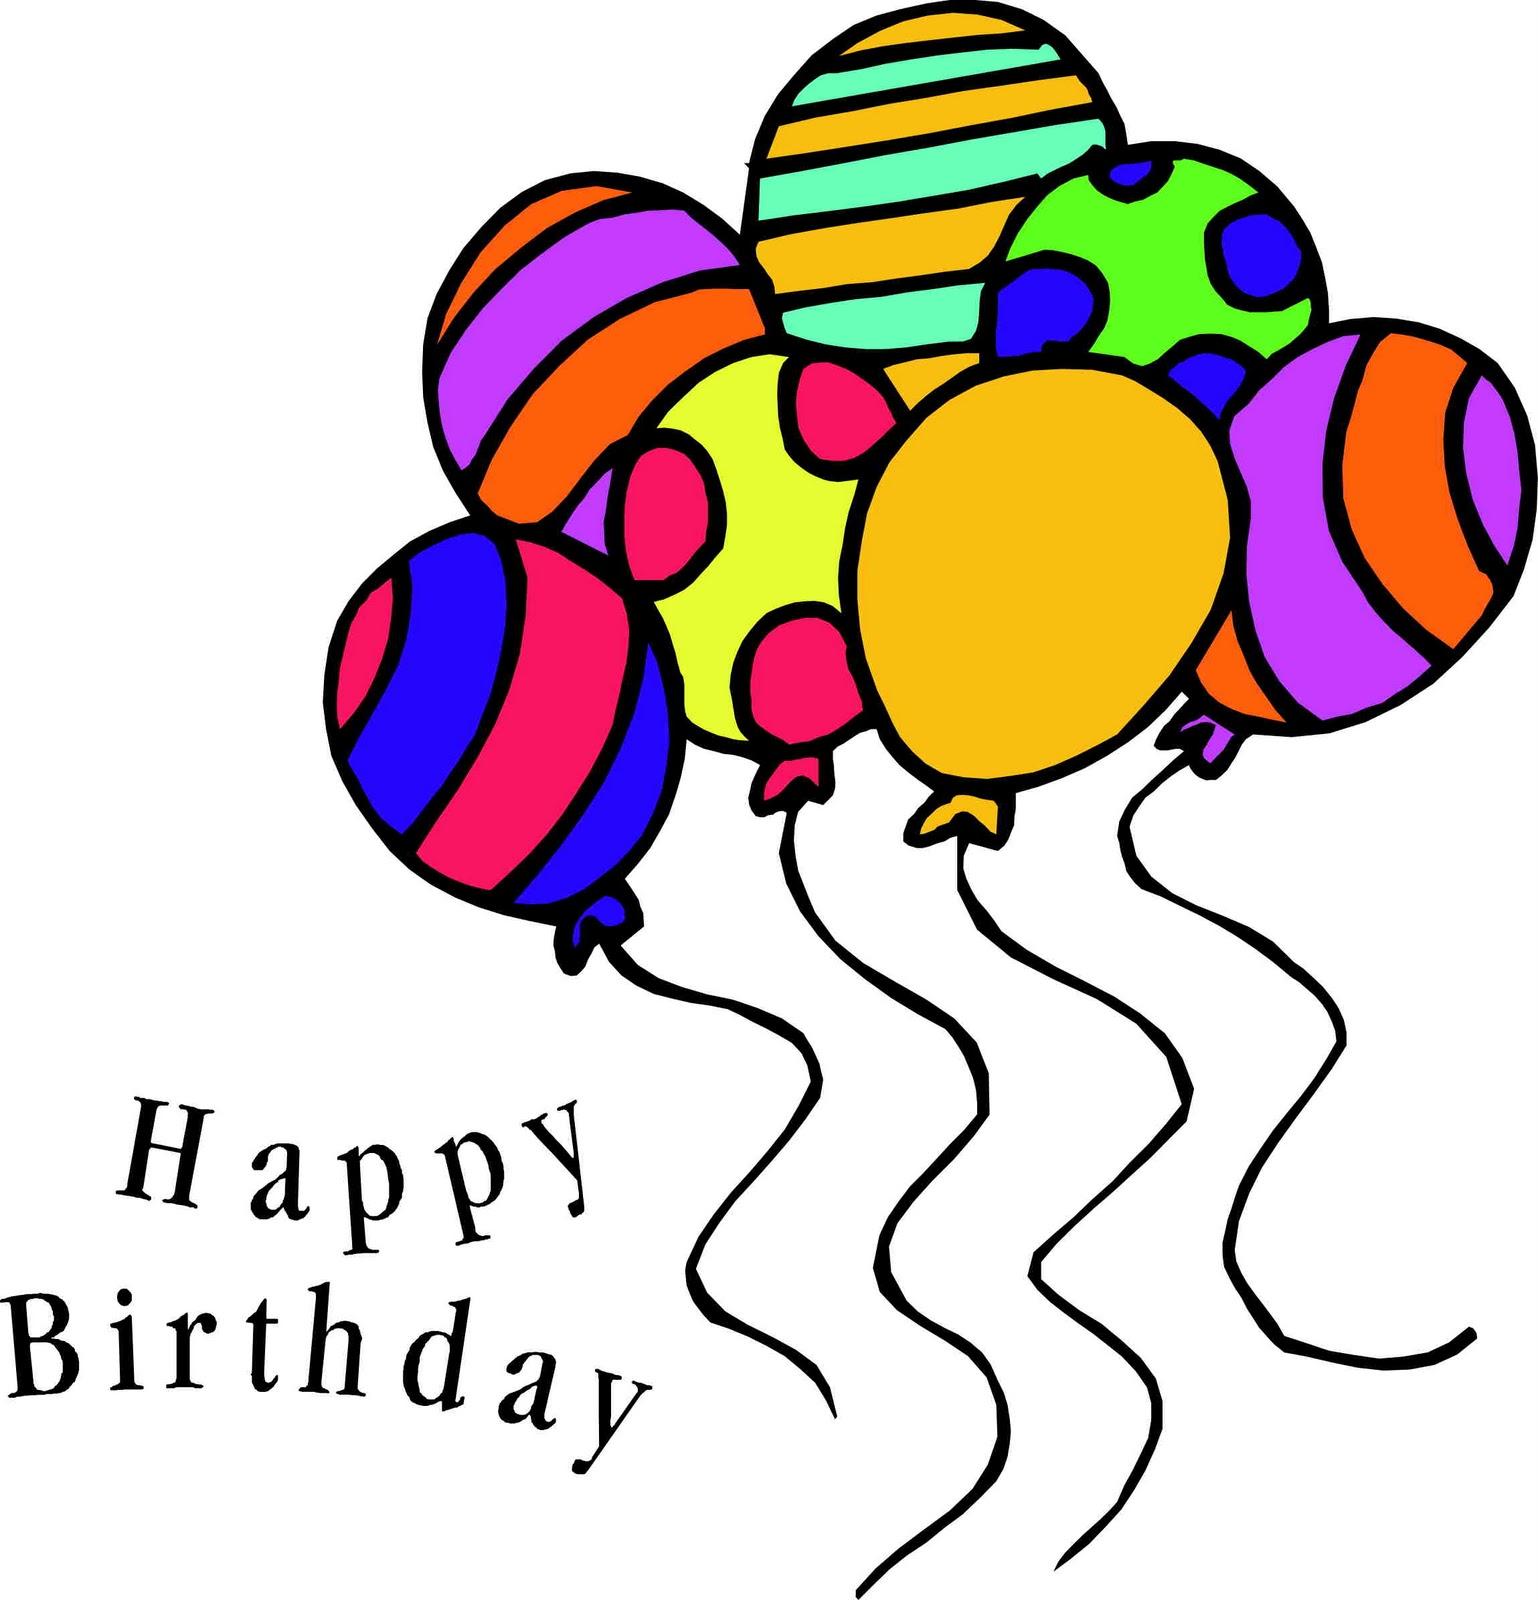 Happy birthday balloons clipartix. 7 clipart balloon